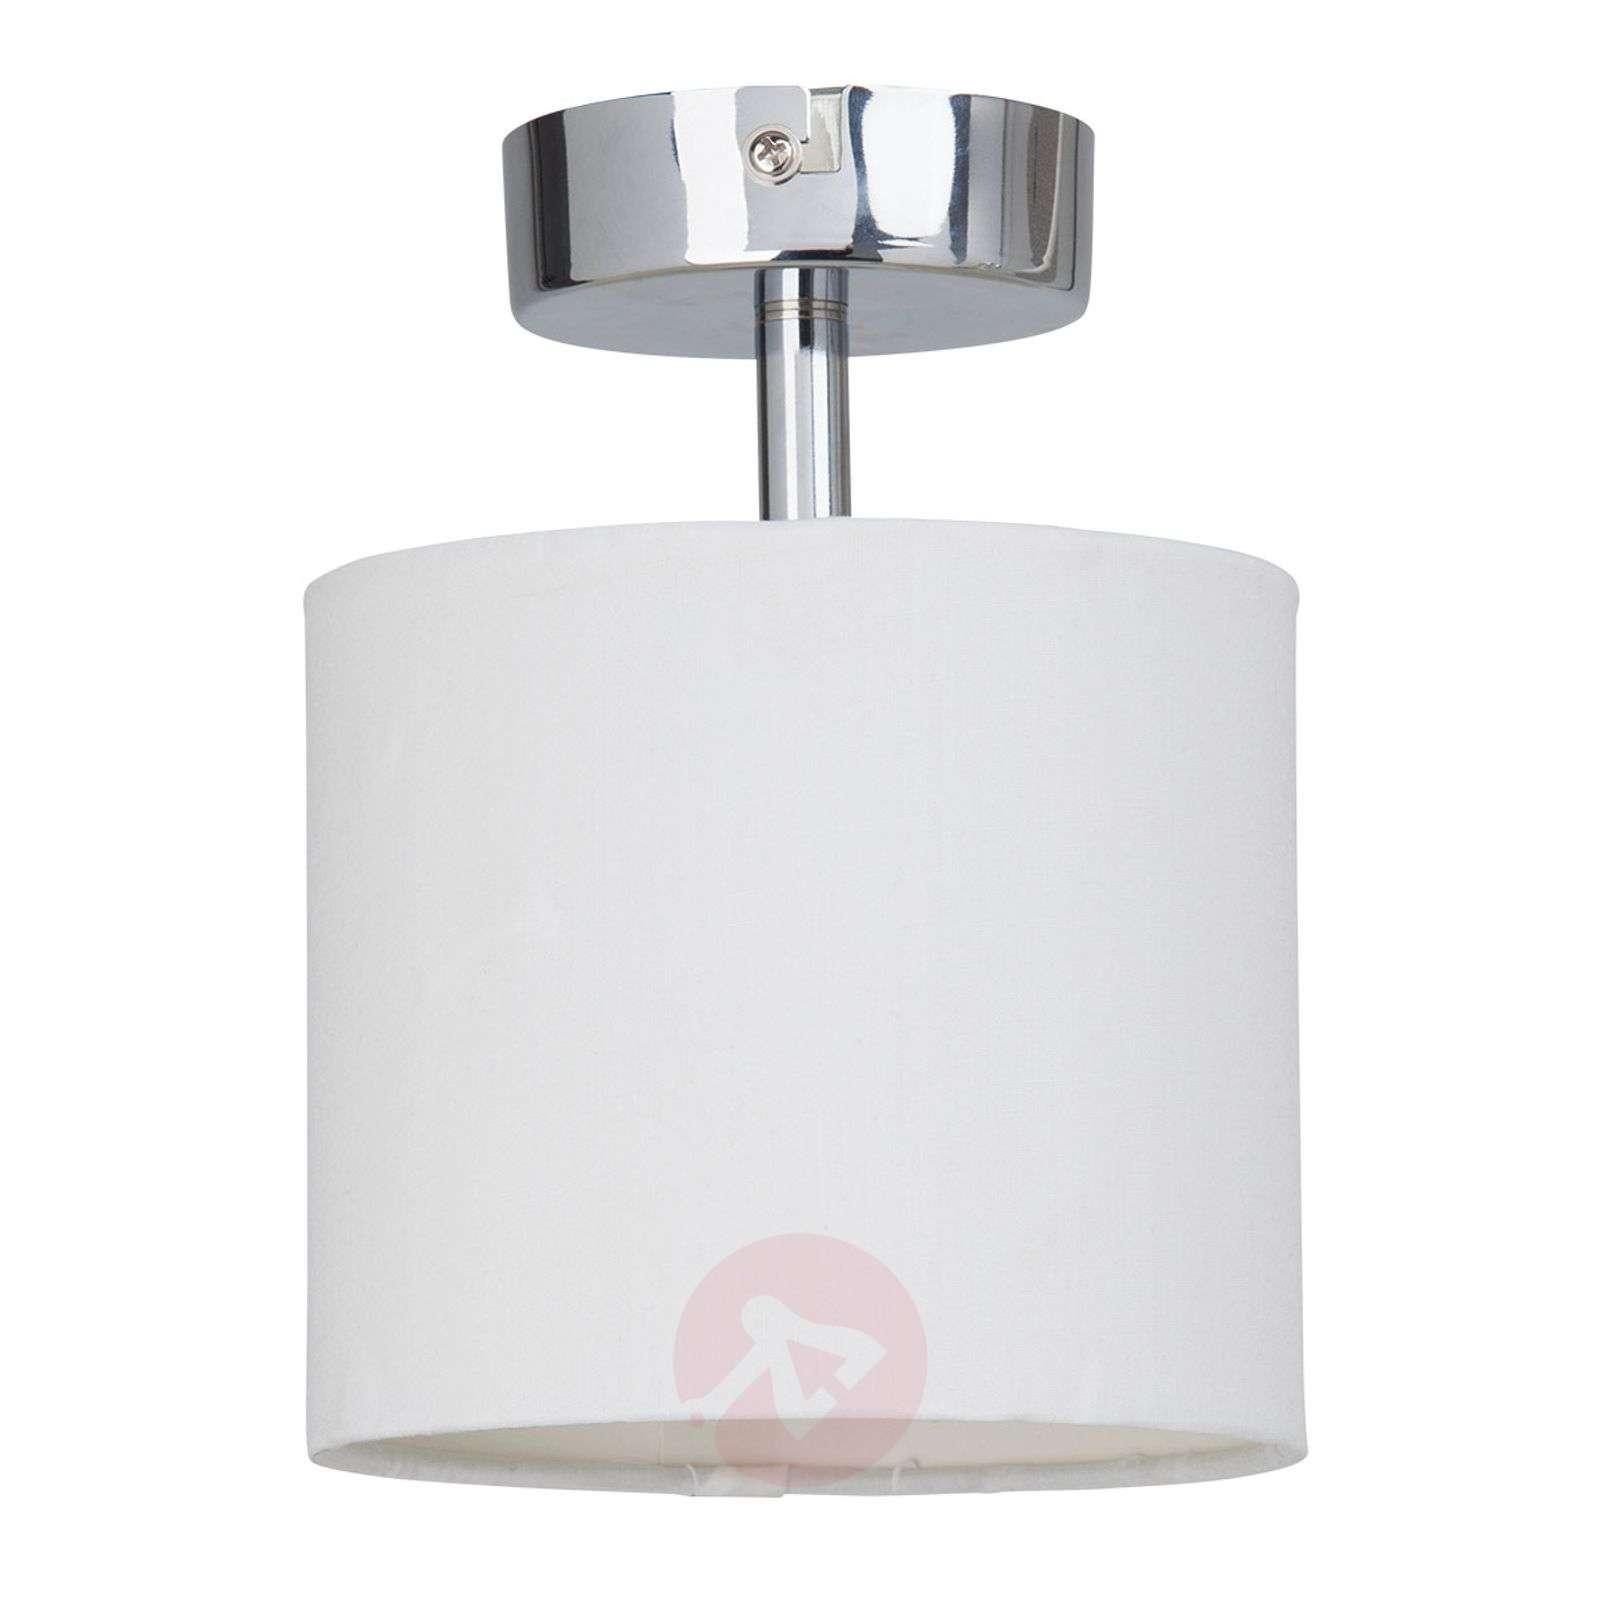 Round fabric ceiling light Sandra-1508887-01